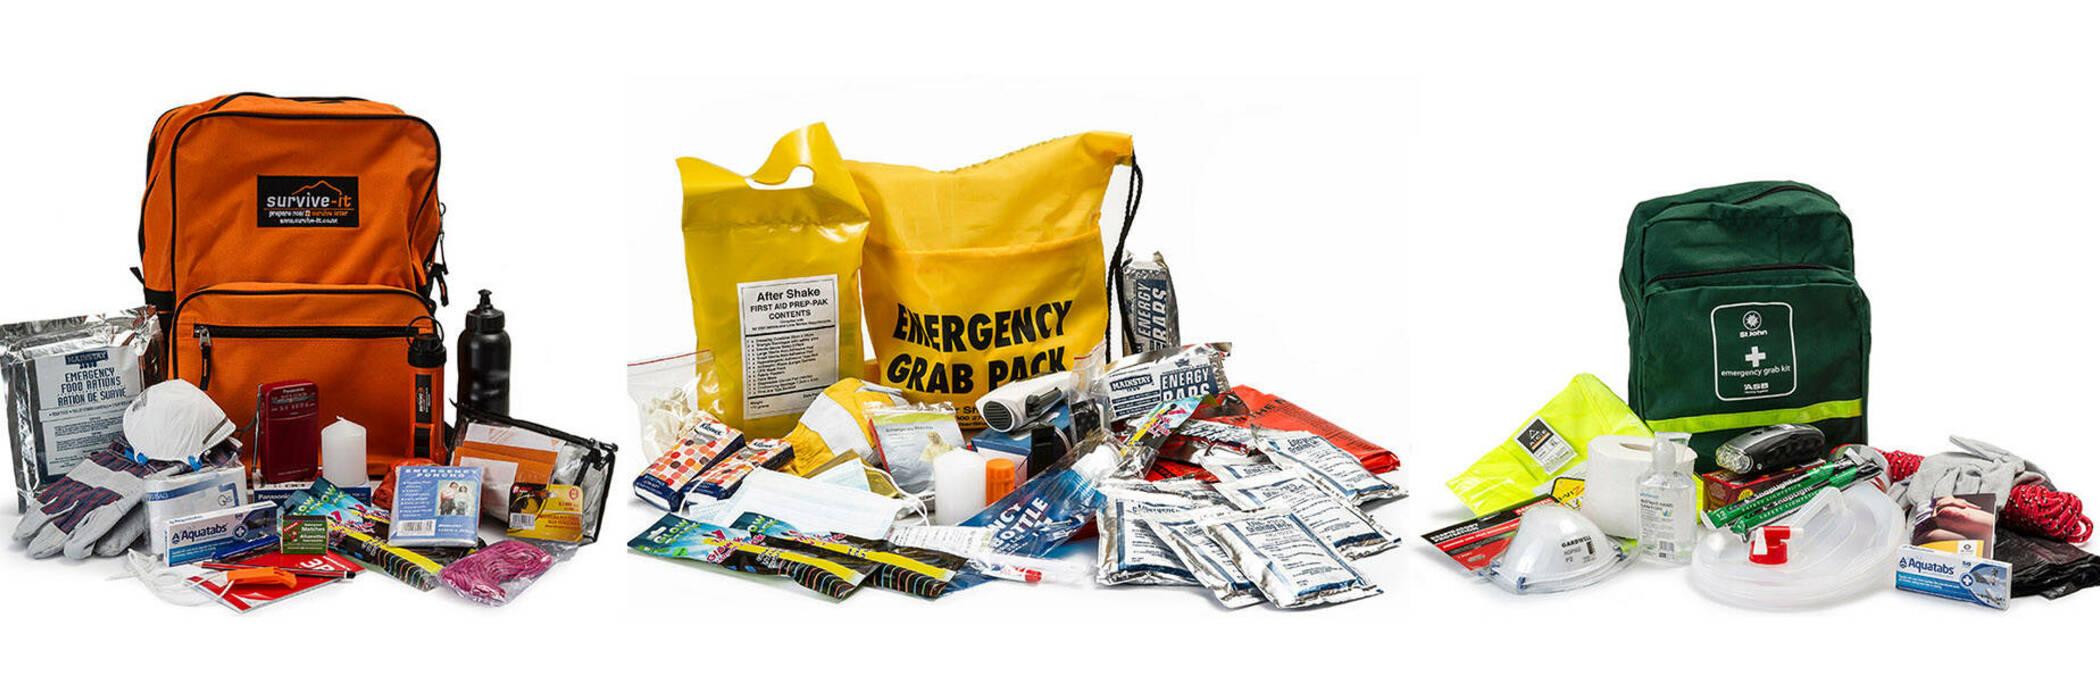 17apr emergency disaster kits press release hero